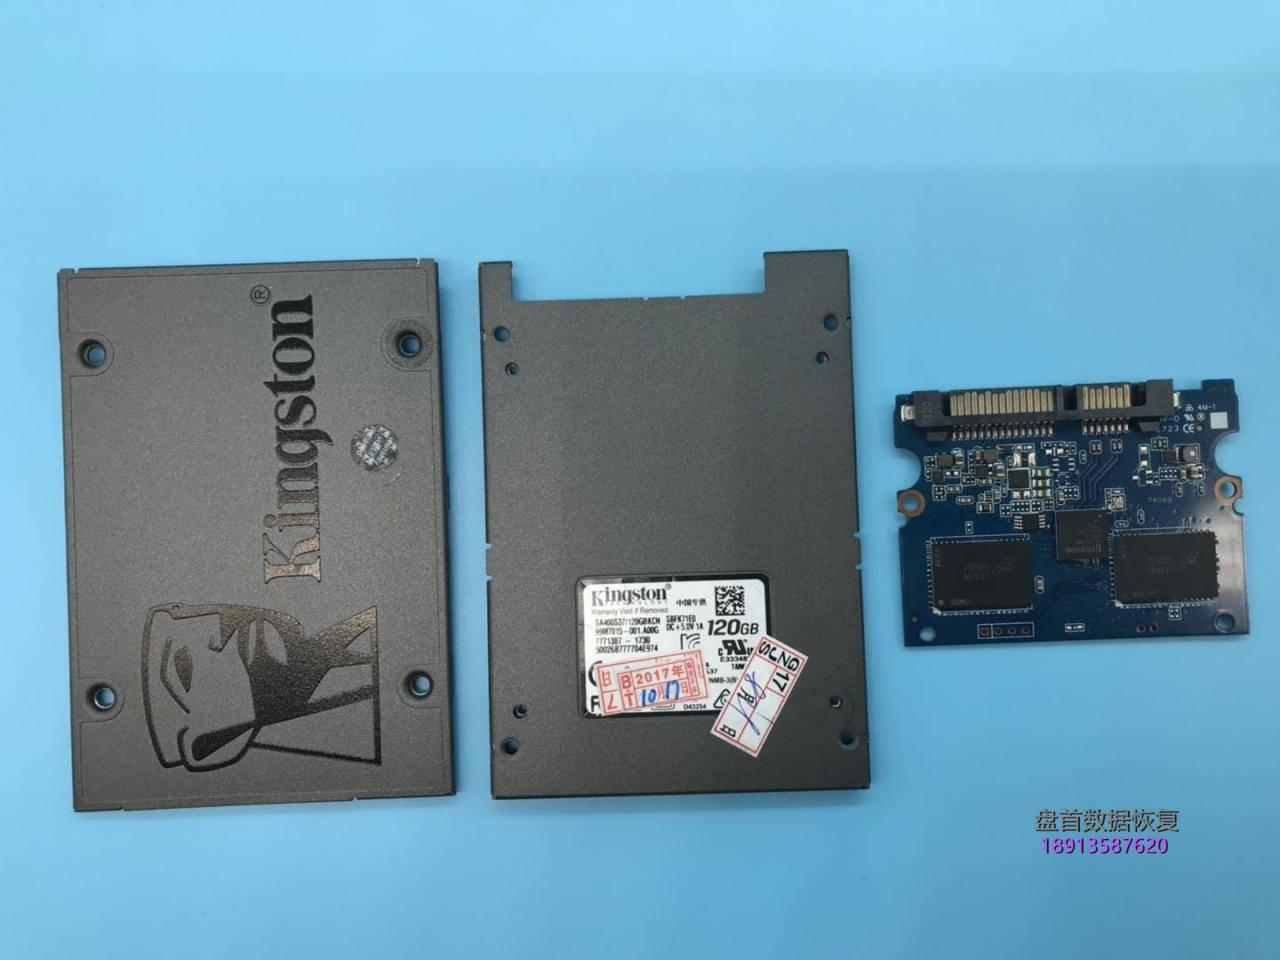 satafirm-s11金士顿kingston-sa400s37-120g-ssd固态硬盘数据恢复成功 SATAFIRM S11金士顿Kingston SA400S37 120G SSD固态硬盘数据恢复成功